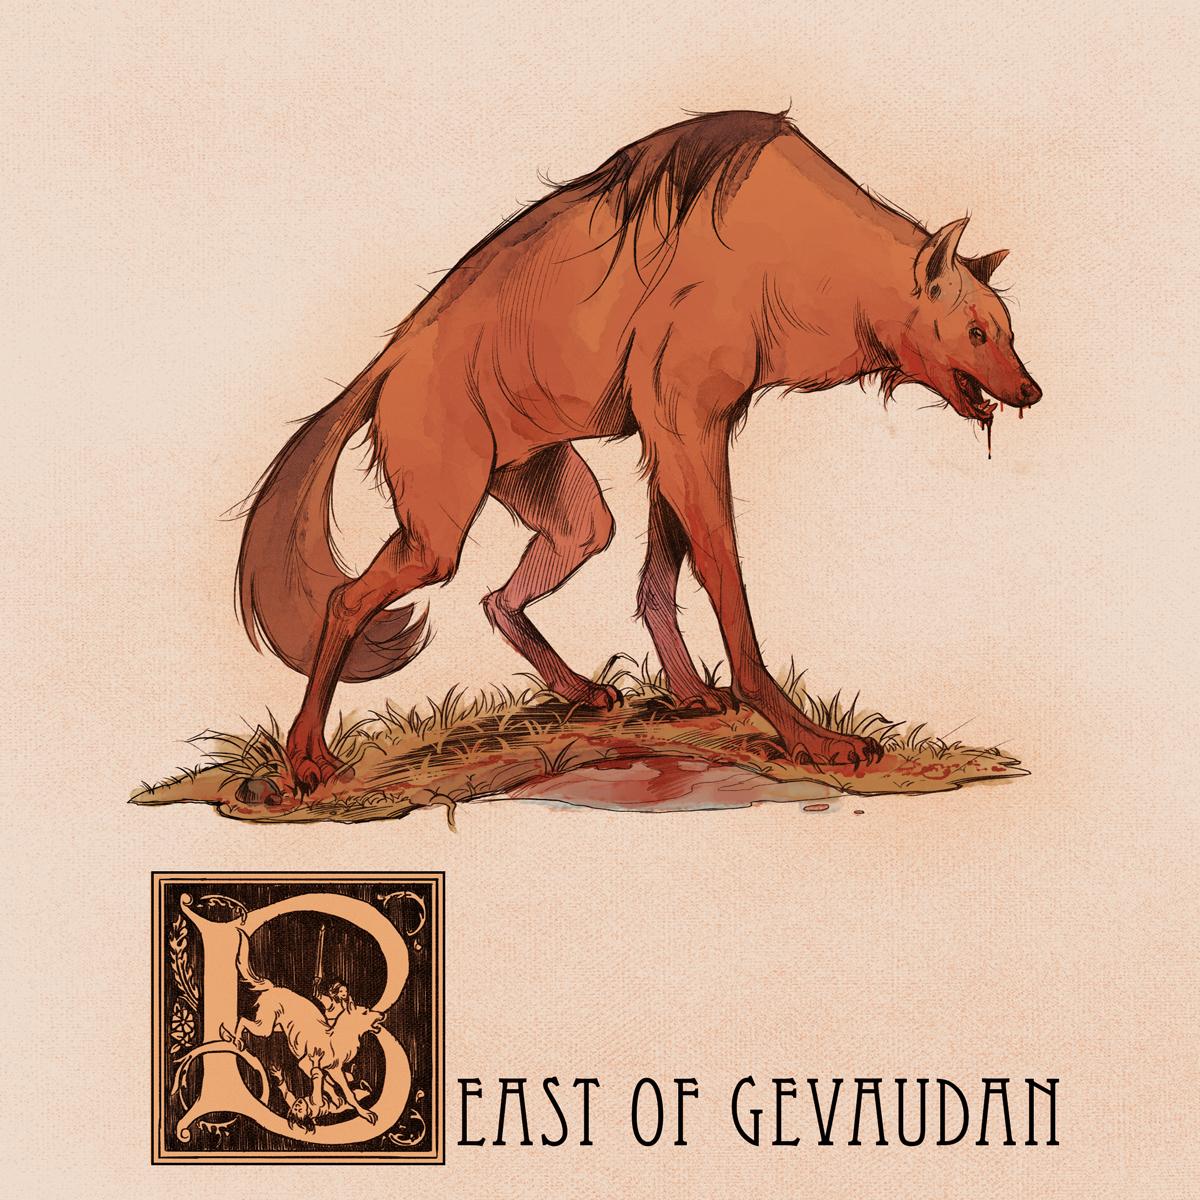 B is for The Beast of Gevaudan by Deimos-Remus